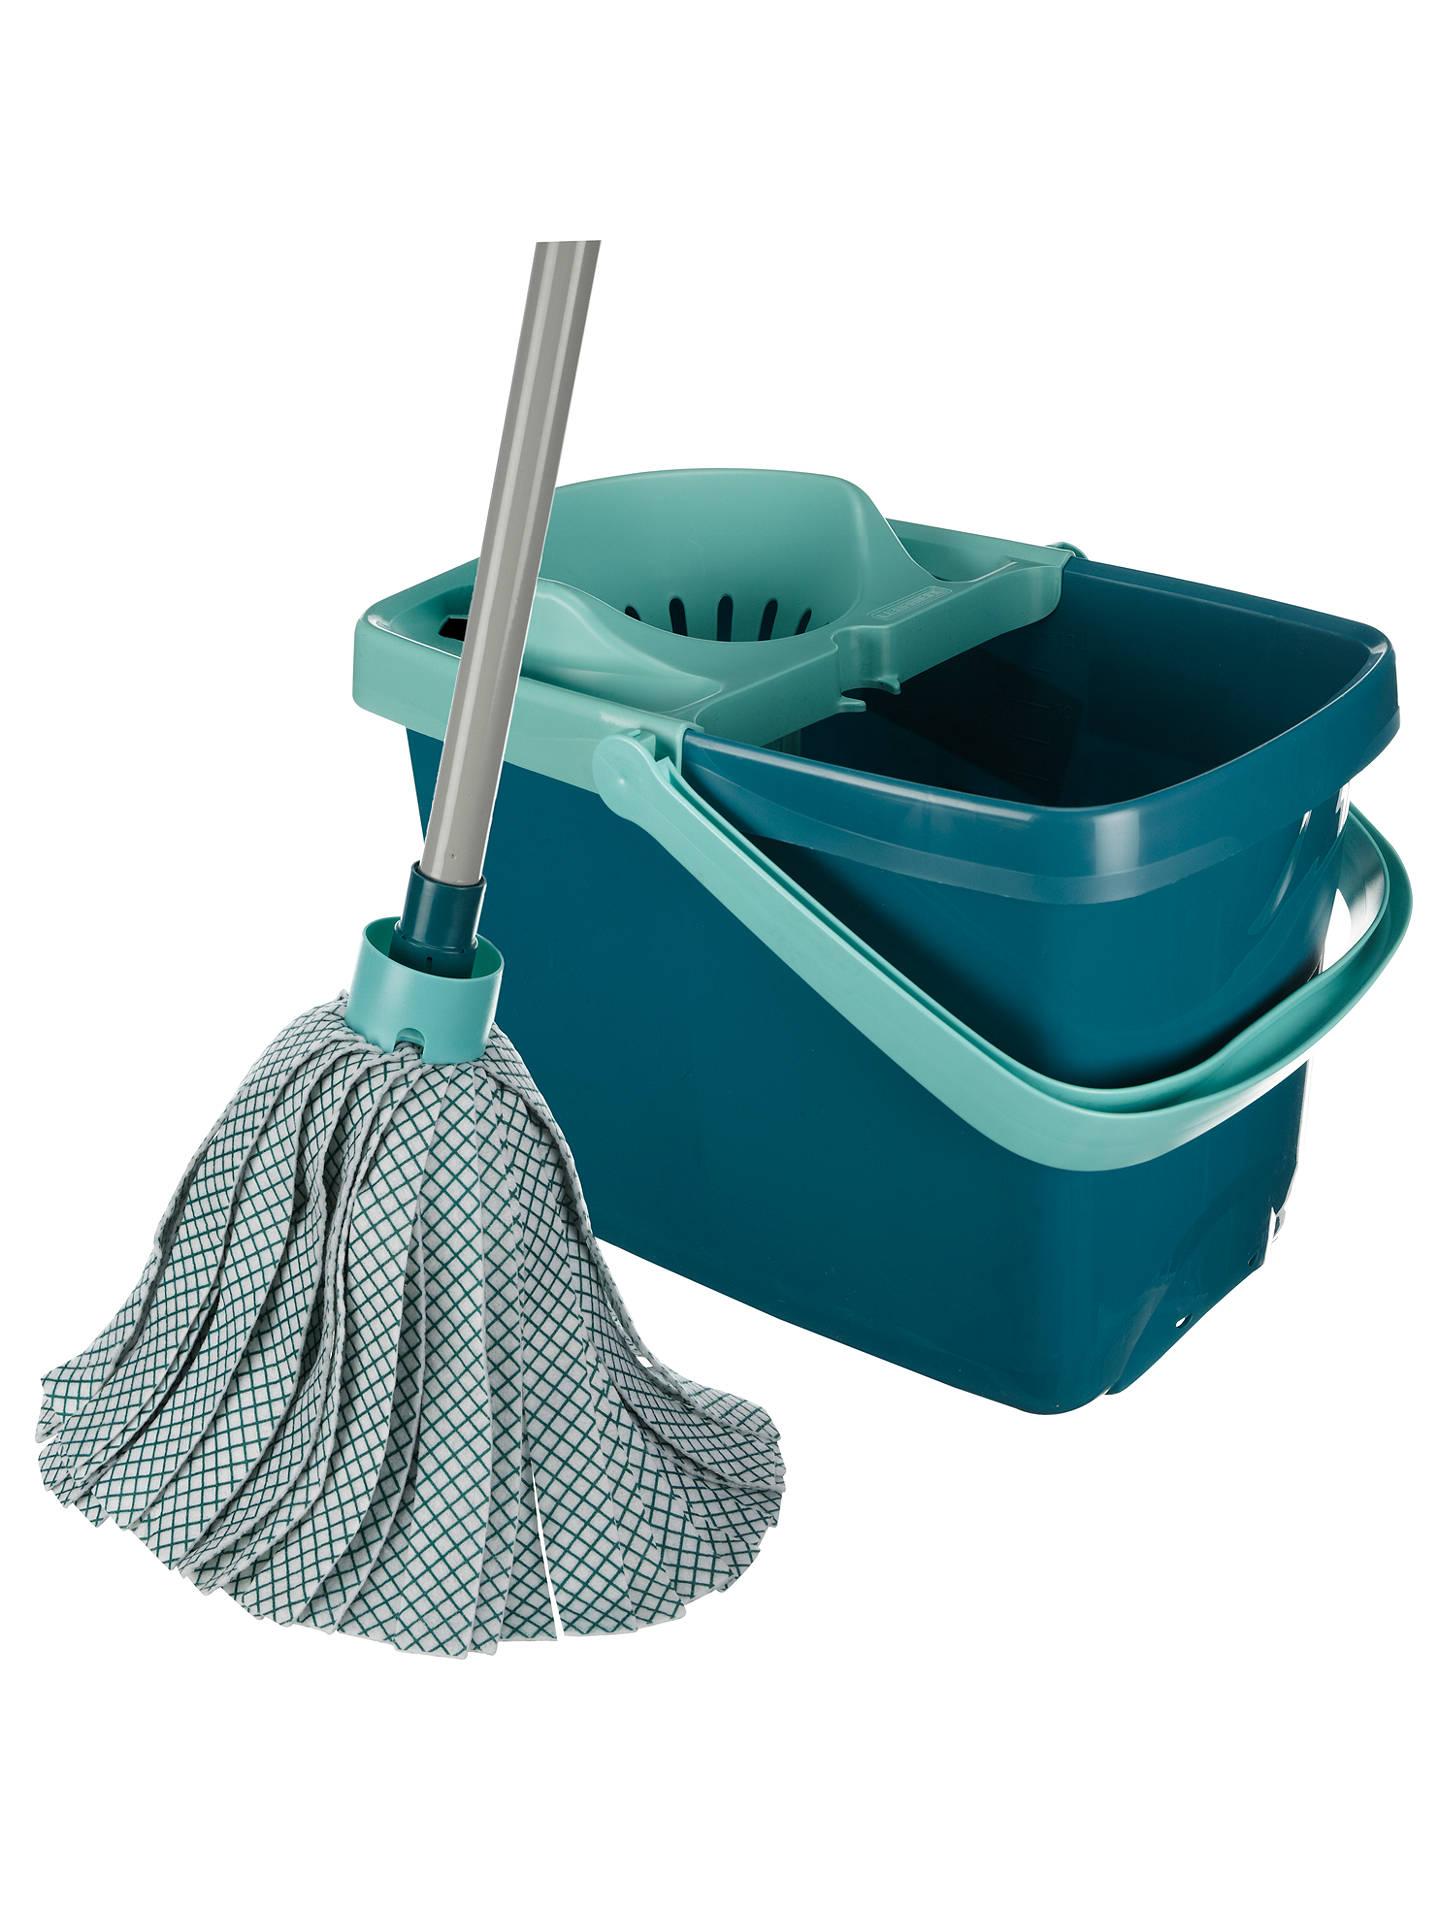 730d289cf9c9 Buy Leifheit Classic Mop and Bucket Set Online at johnlewis.com ...